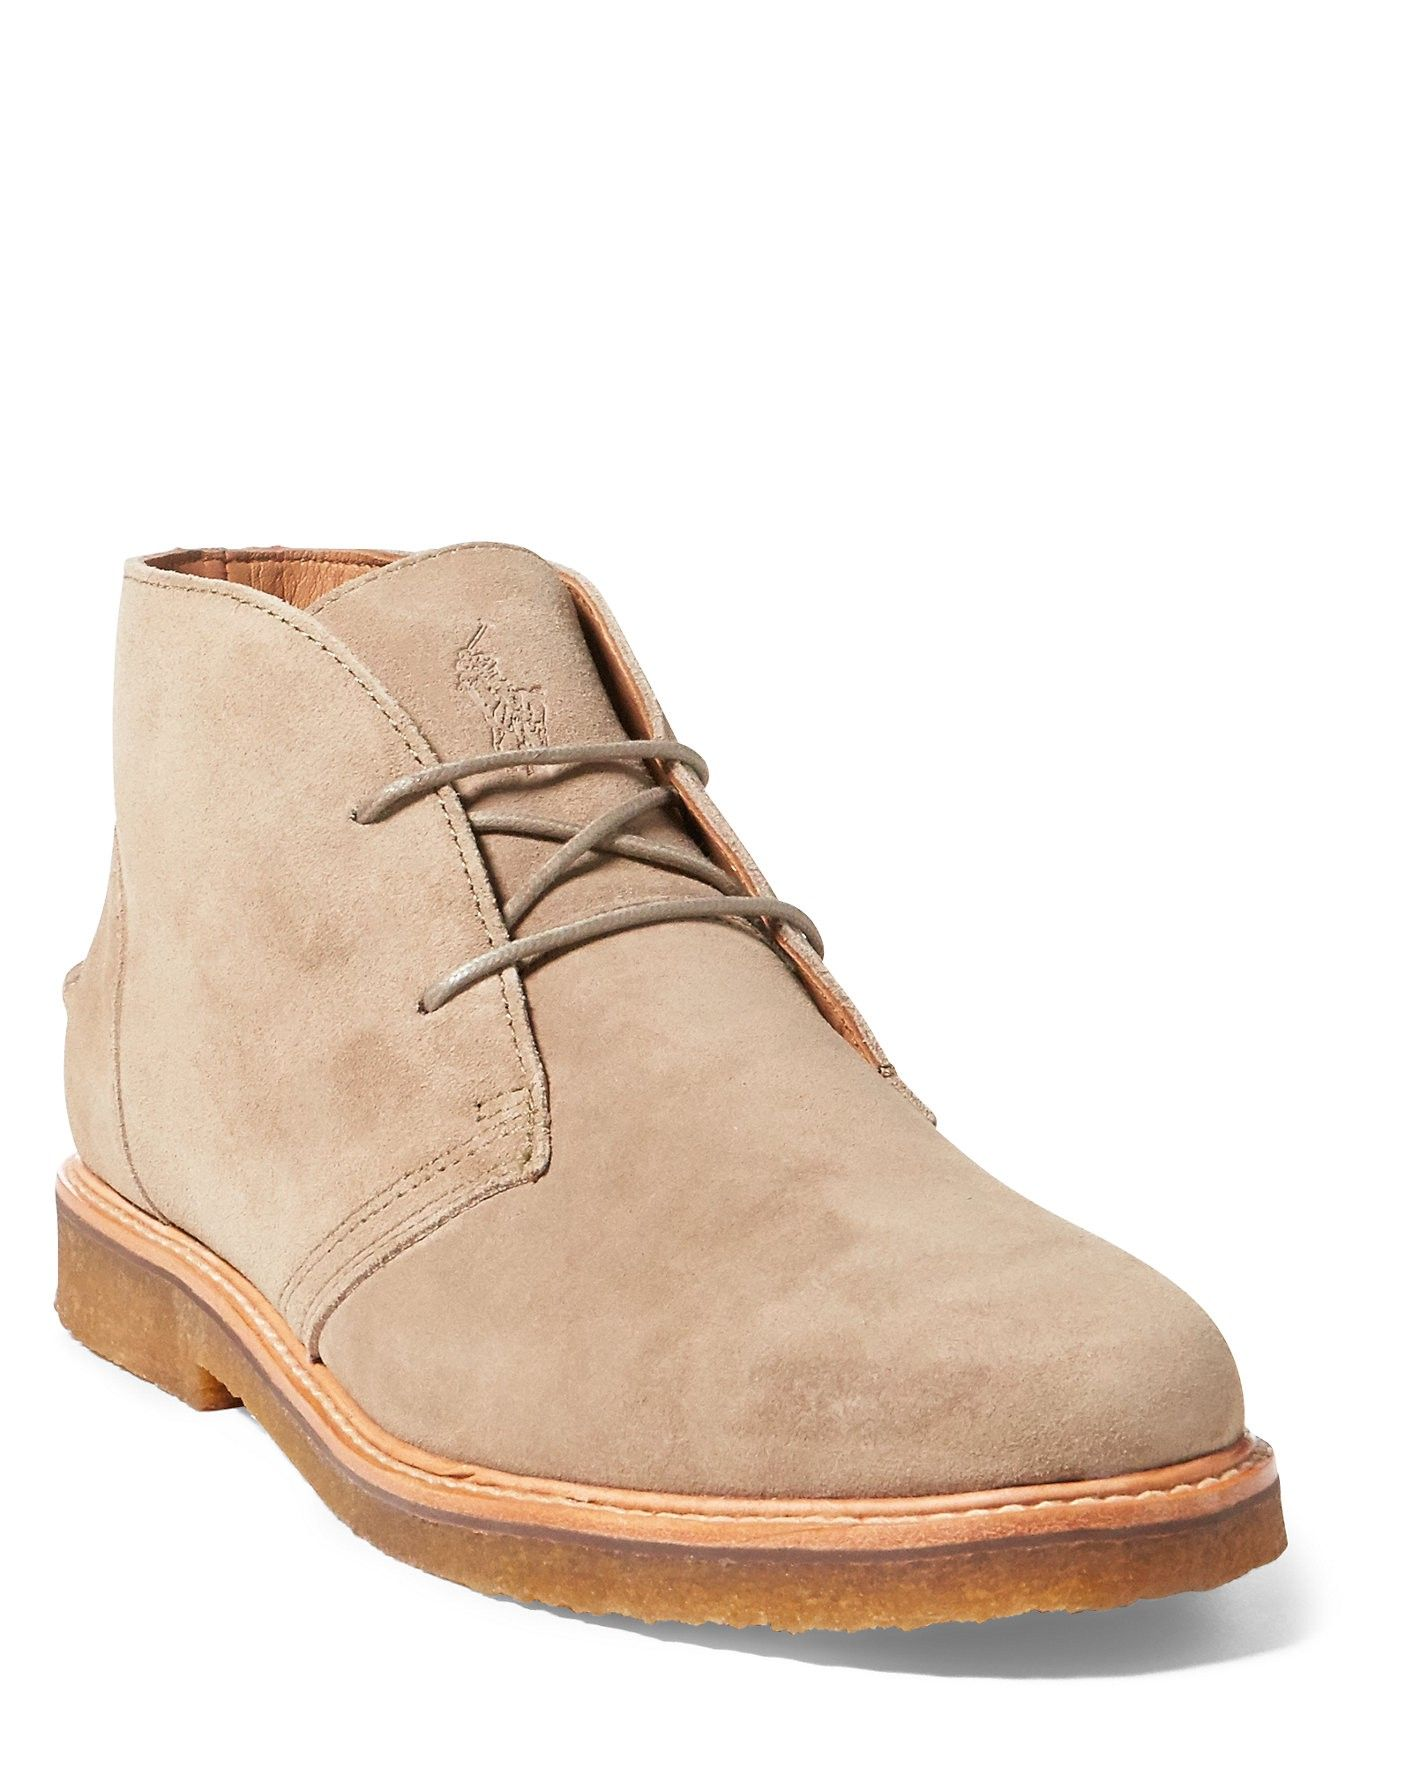 polo ralph lauren shoes casual men s chukka